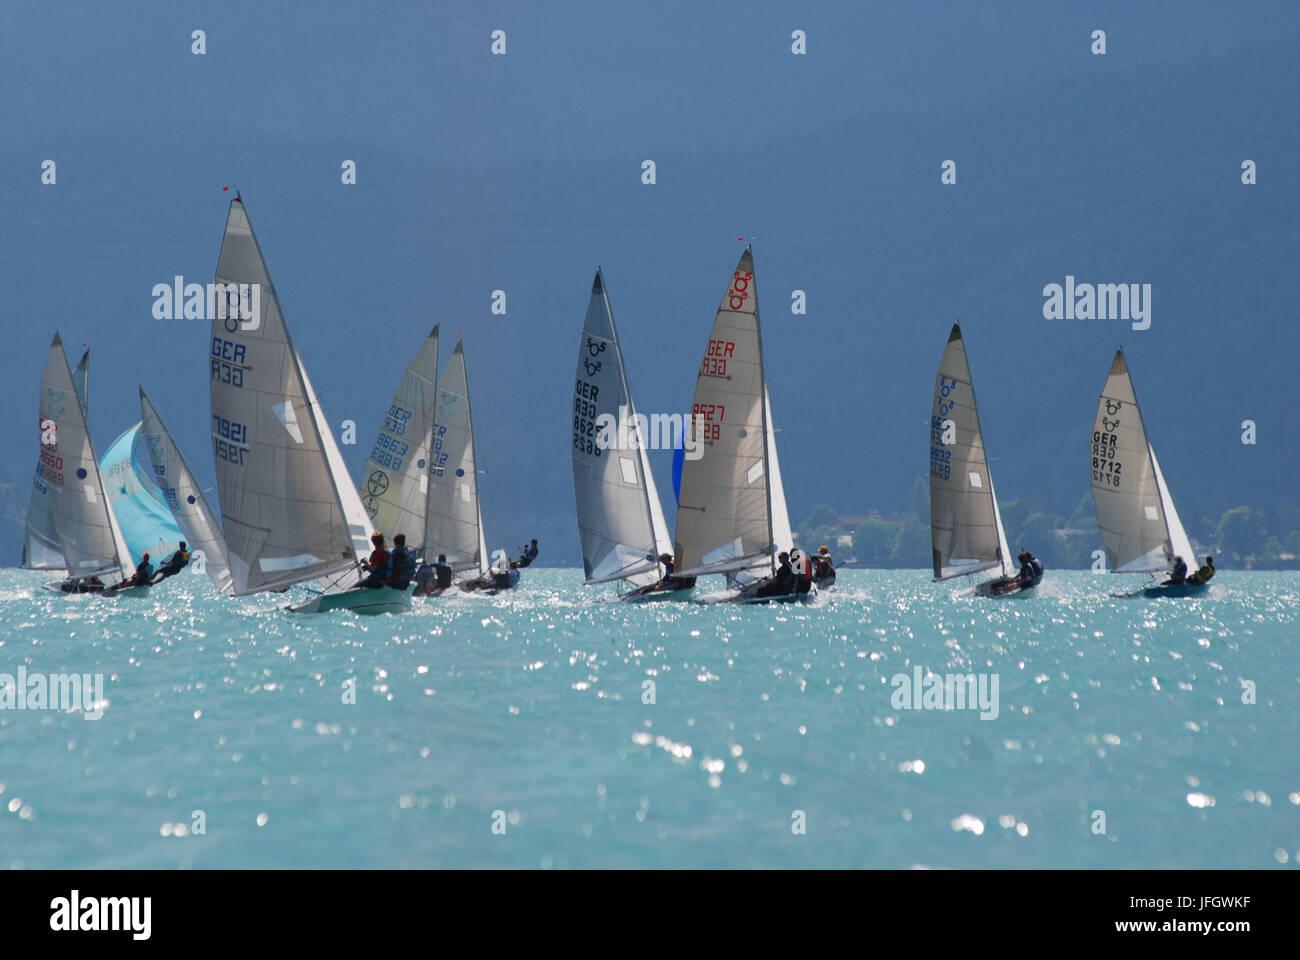 Germany, Bavaria, alpine upland, Walchensee, sailboats, regatta, summer - Stock Image